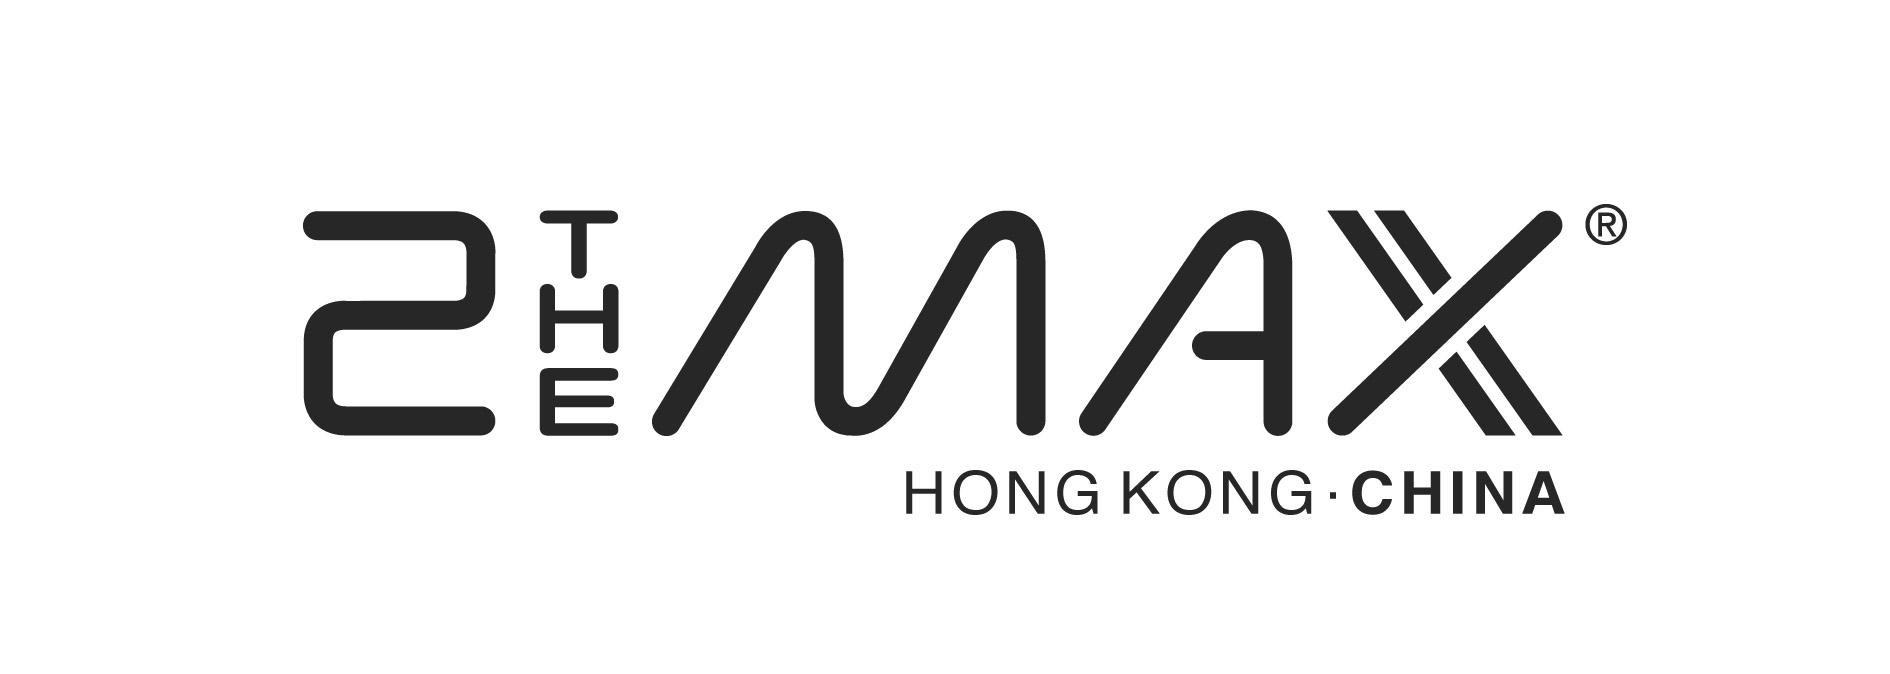 2themax_logo.jpg